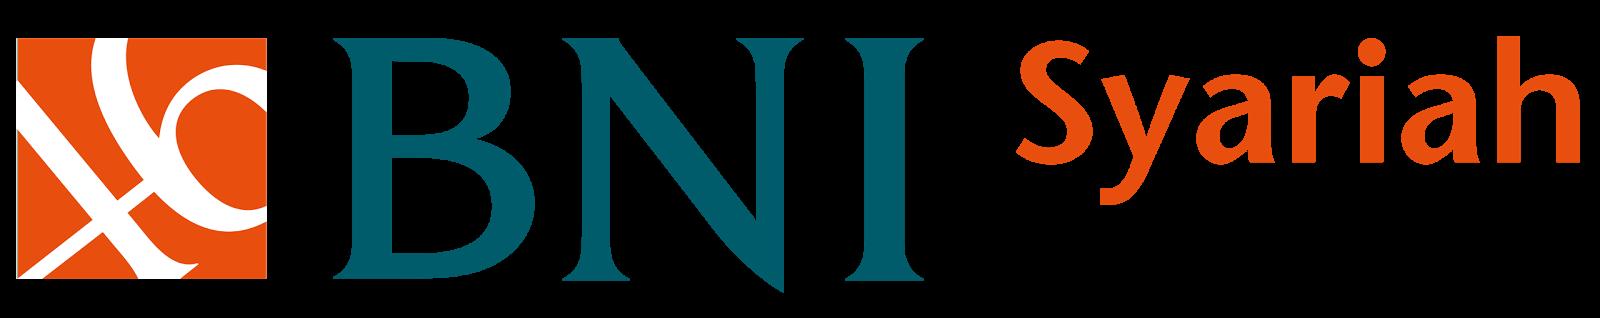 Lowongan Kerja Bank Terbaru Bulan Februari 2018 (BNI Syariah)